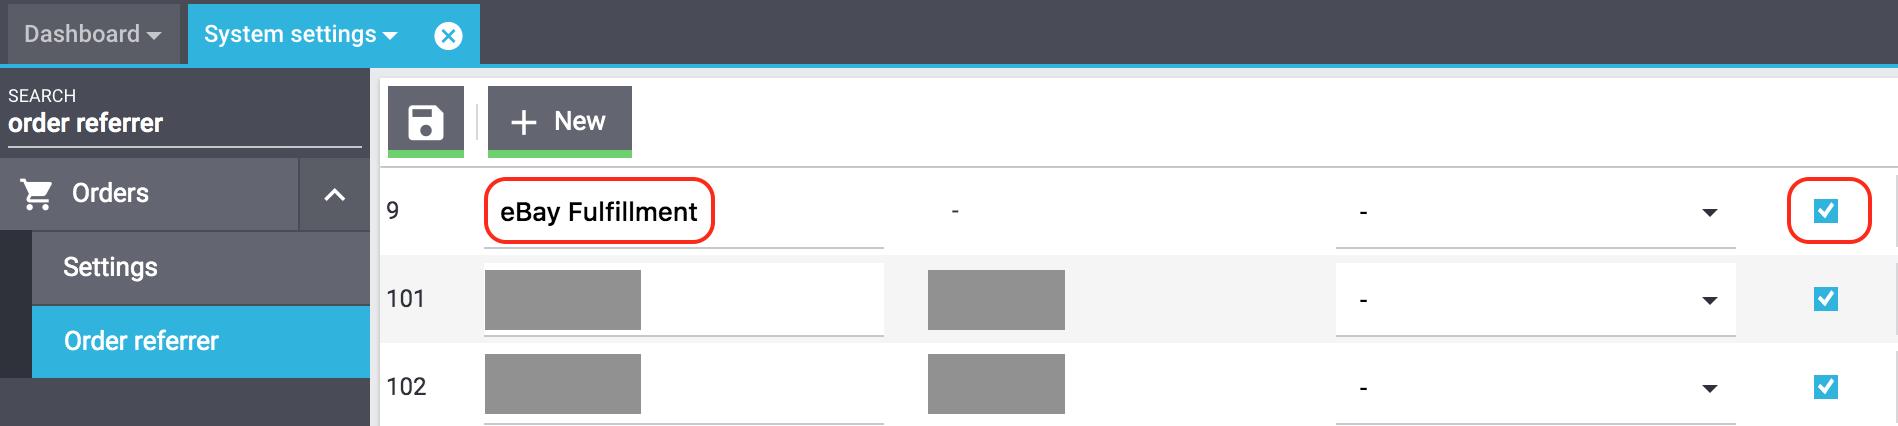 eBay Fulfillment activate order referrer